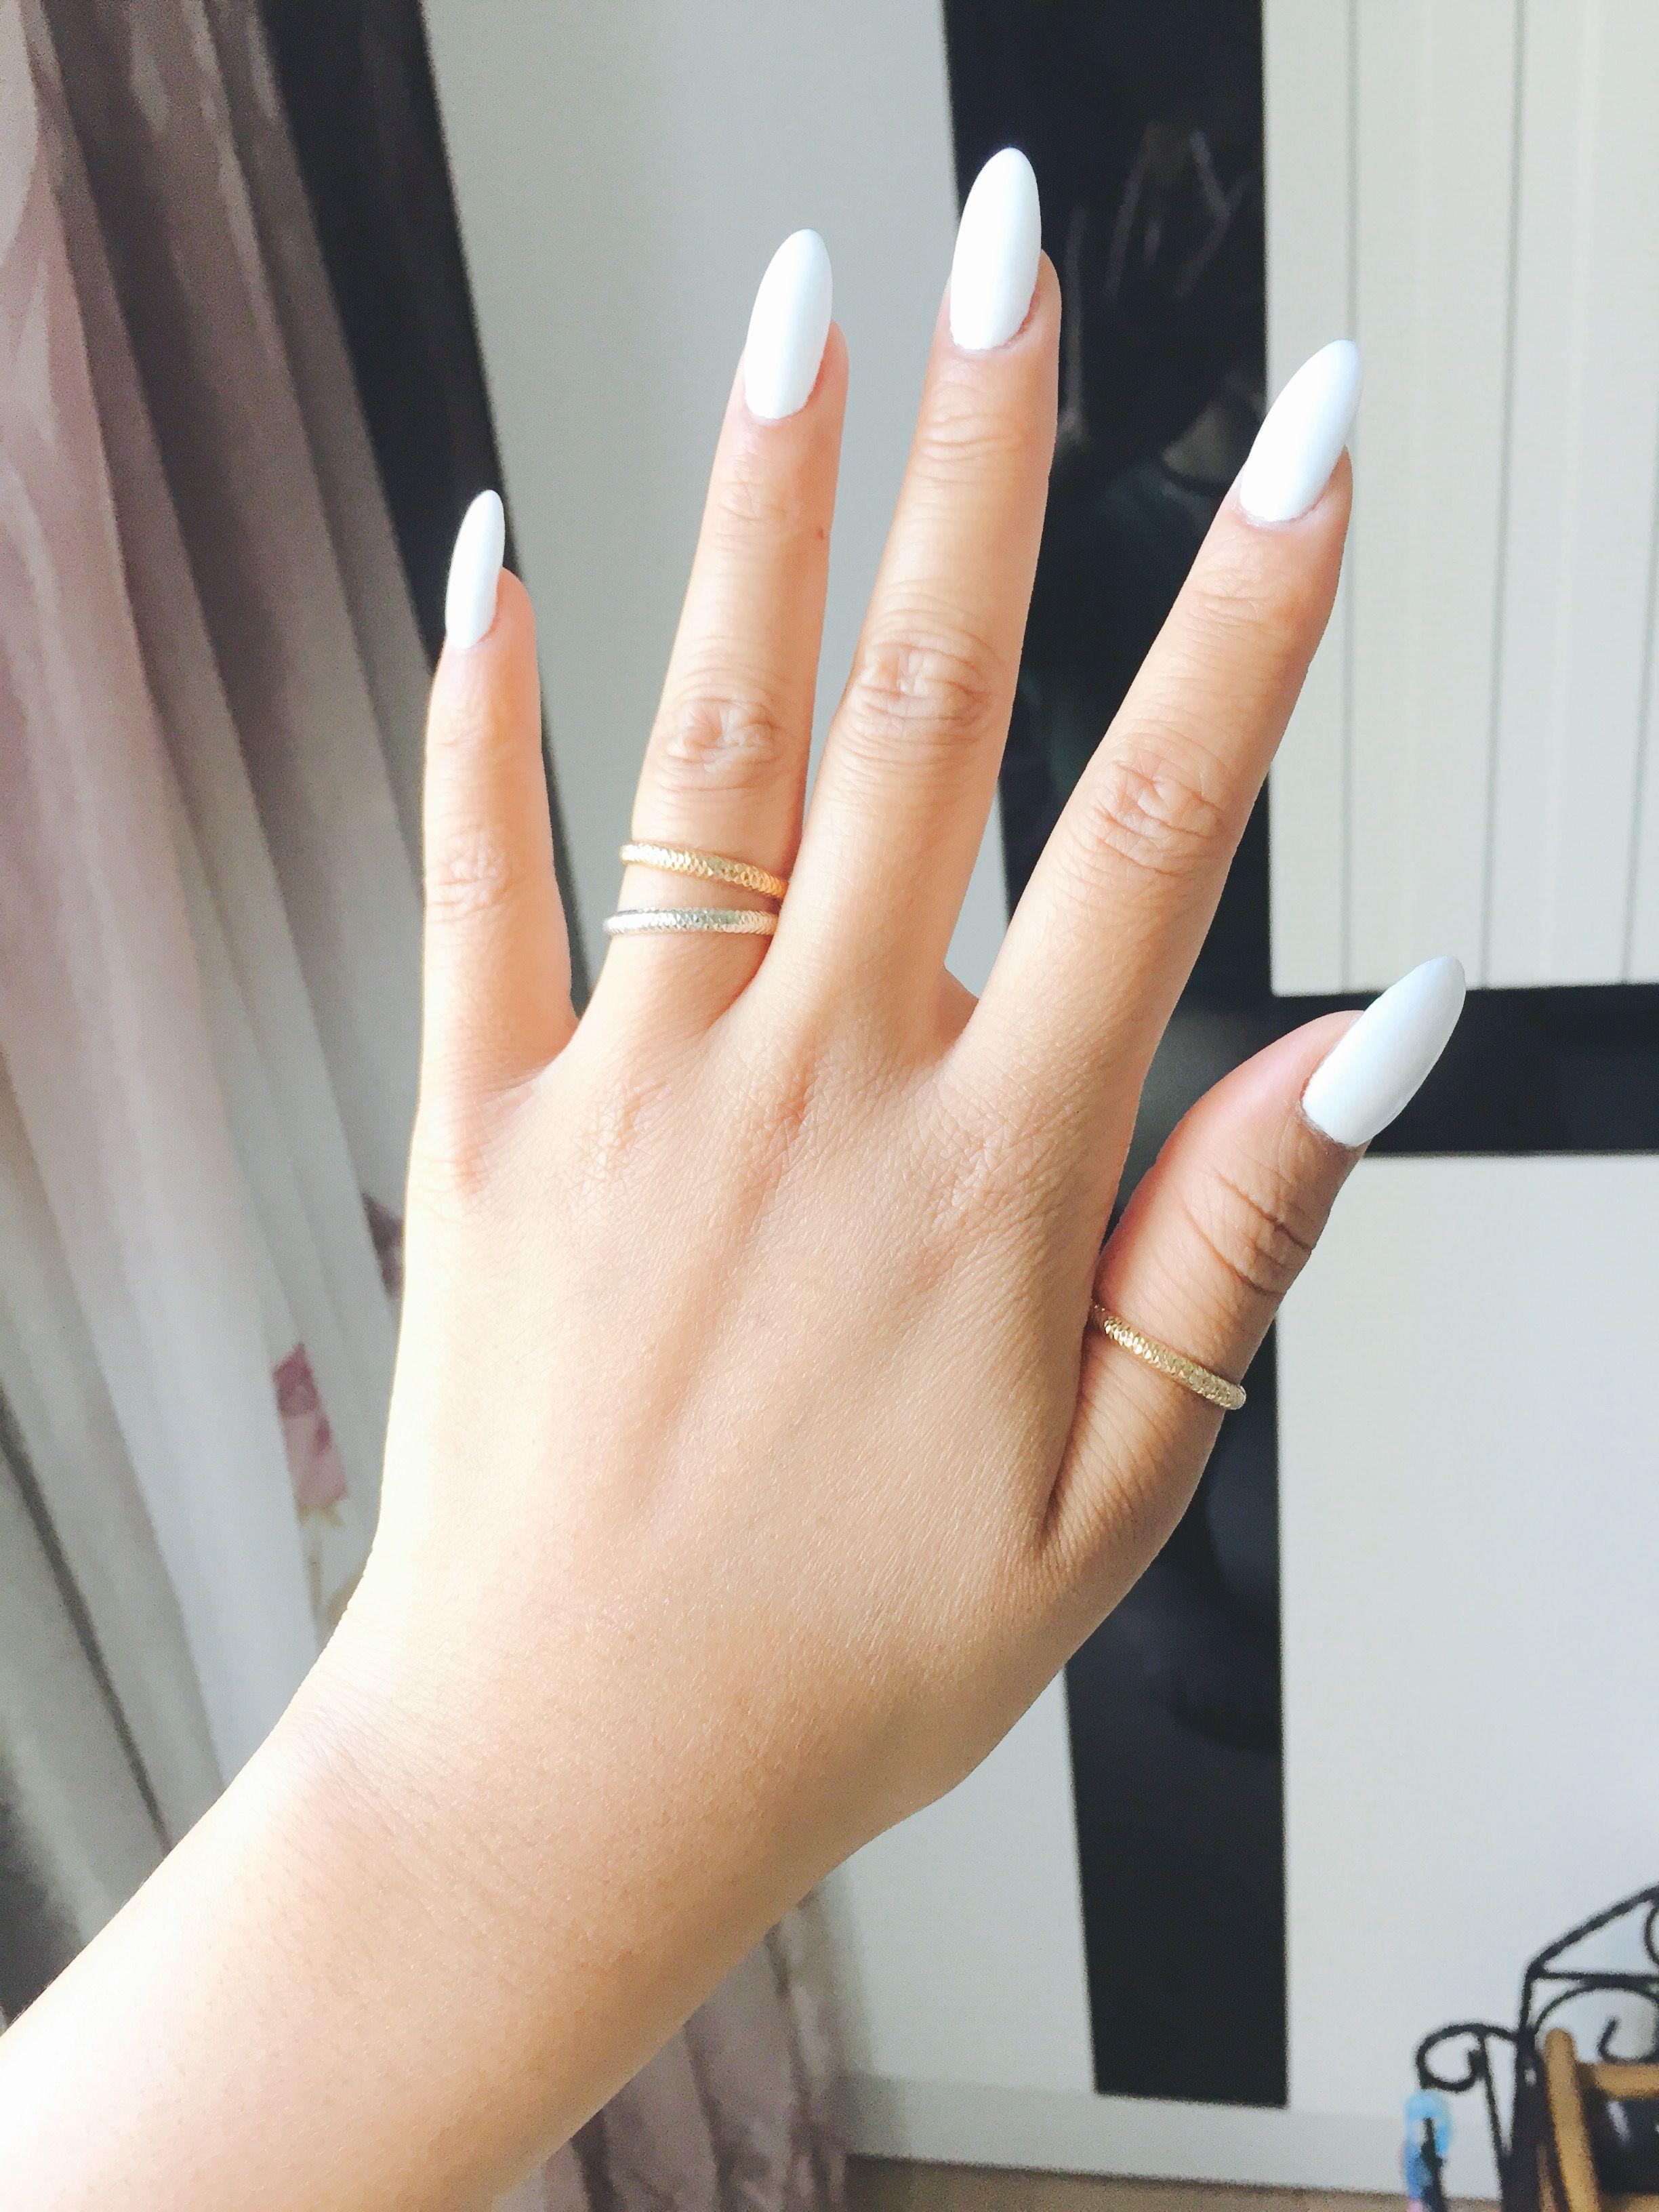 Plain White Almond Gel Nails Almond Gel Nails White Gel Nails Almond Acrylic Nails